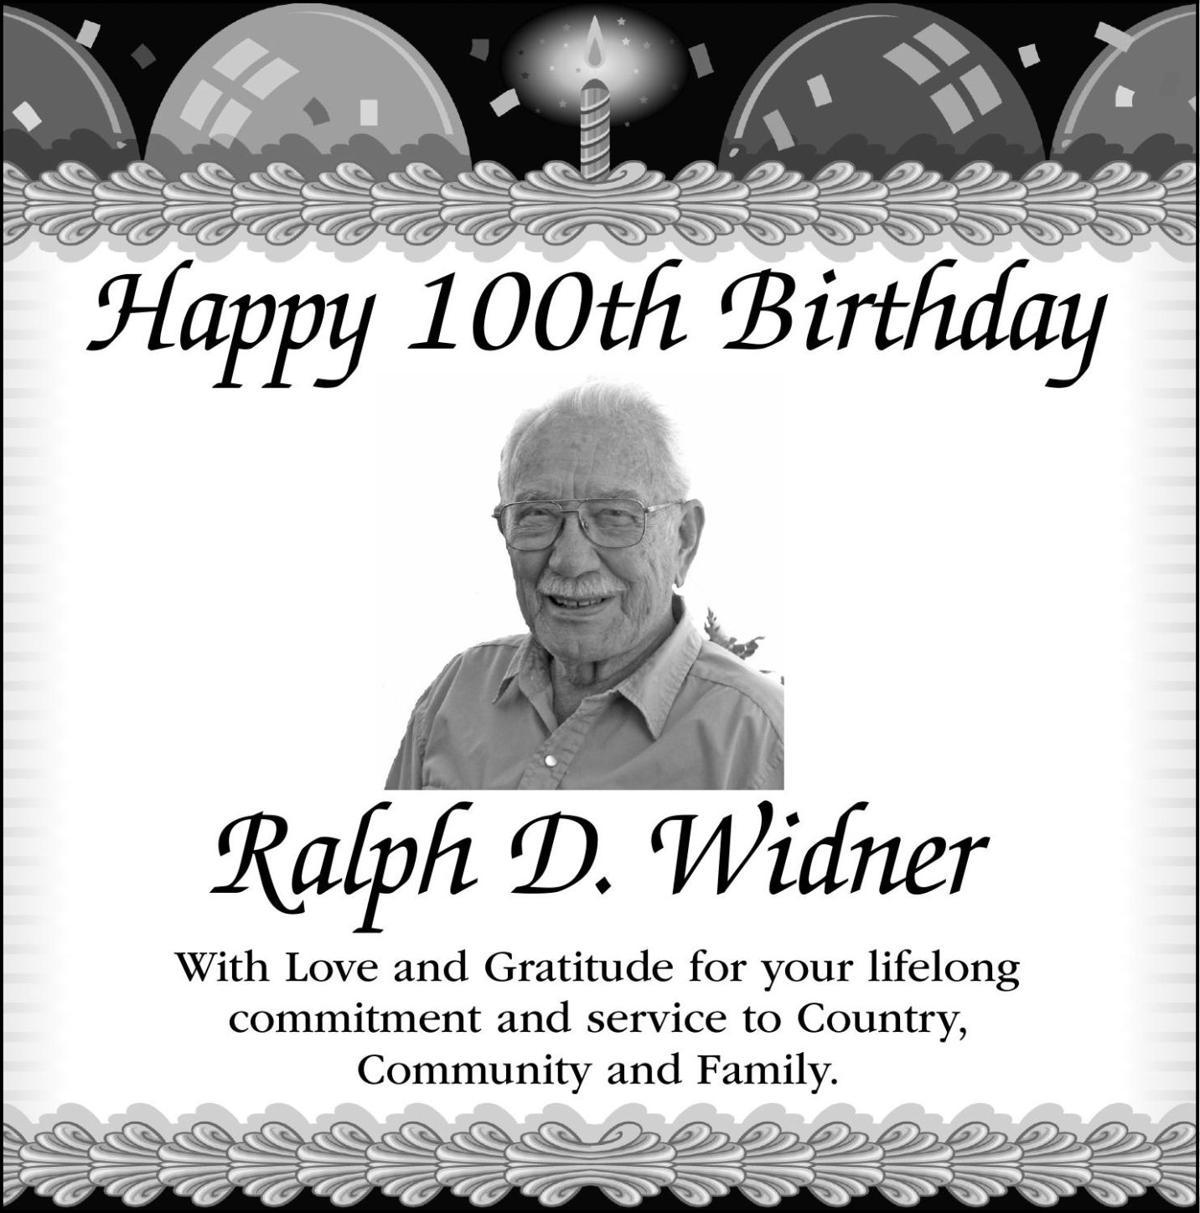 Ralph D. Widner